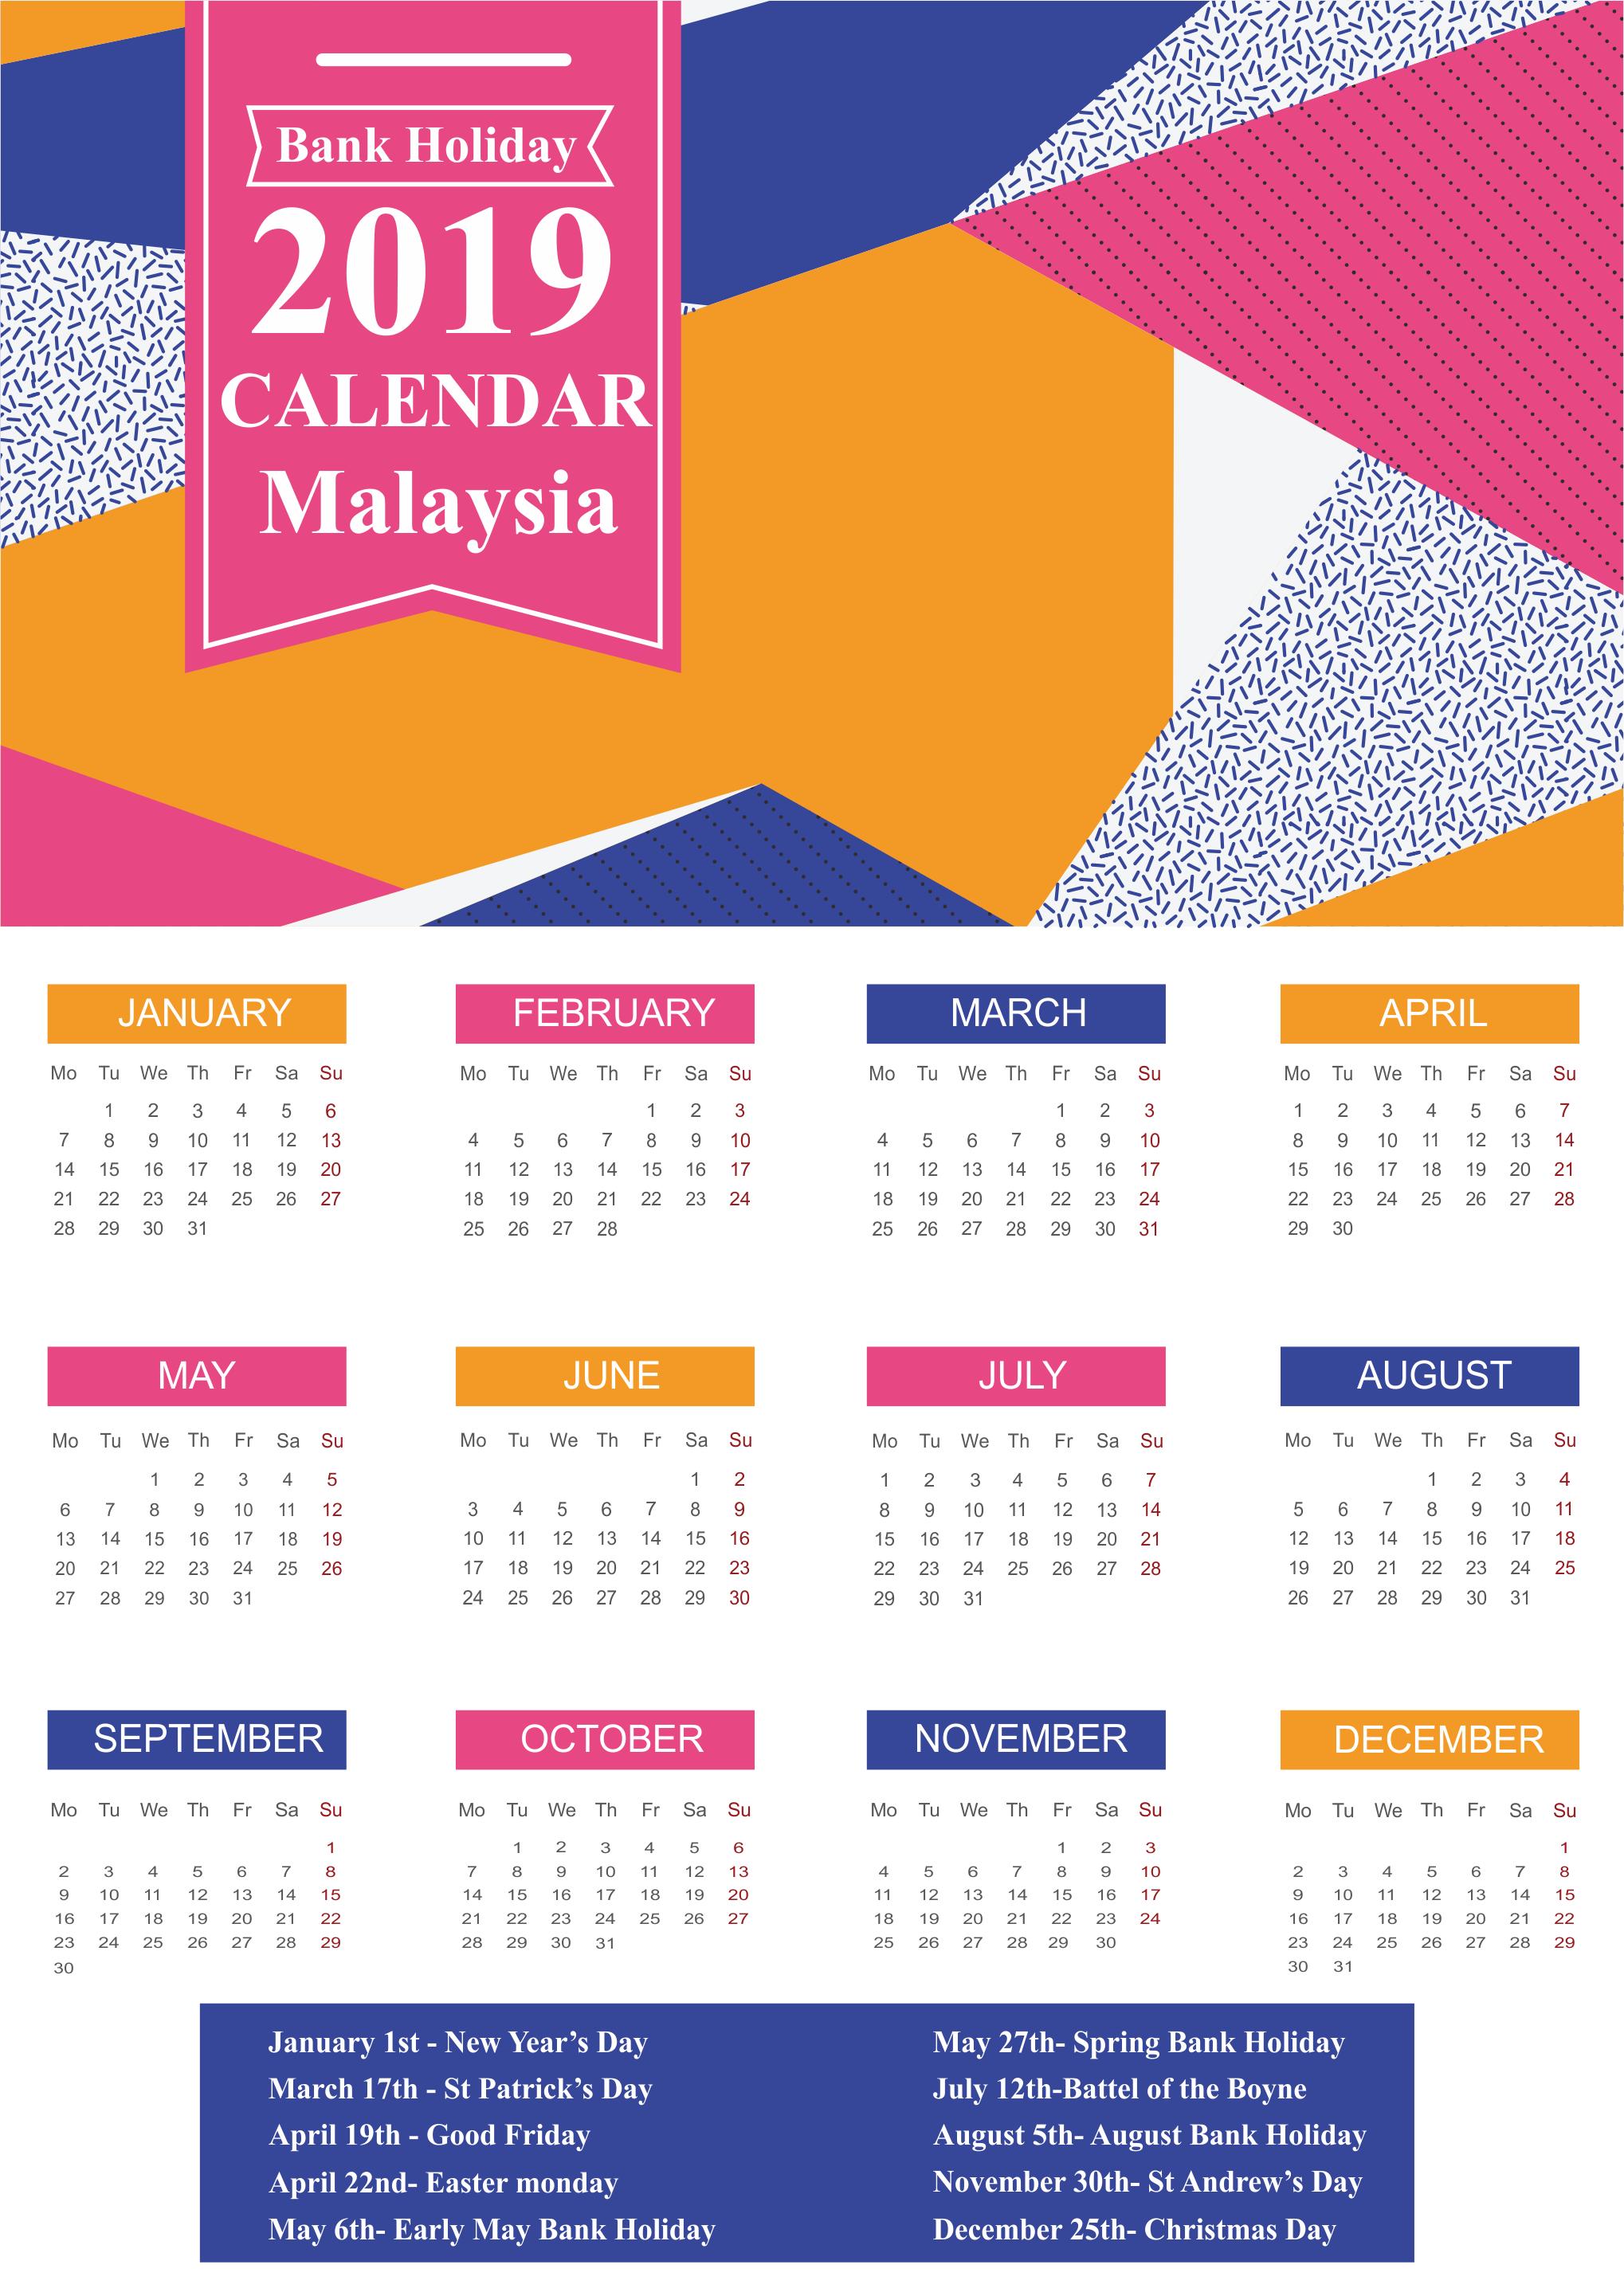 Bank Holidays 2019 Malaysia